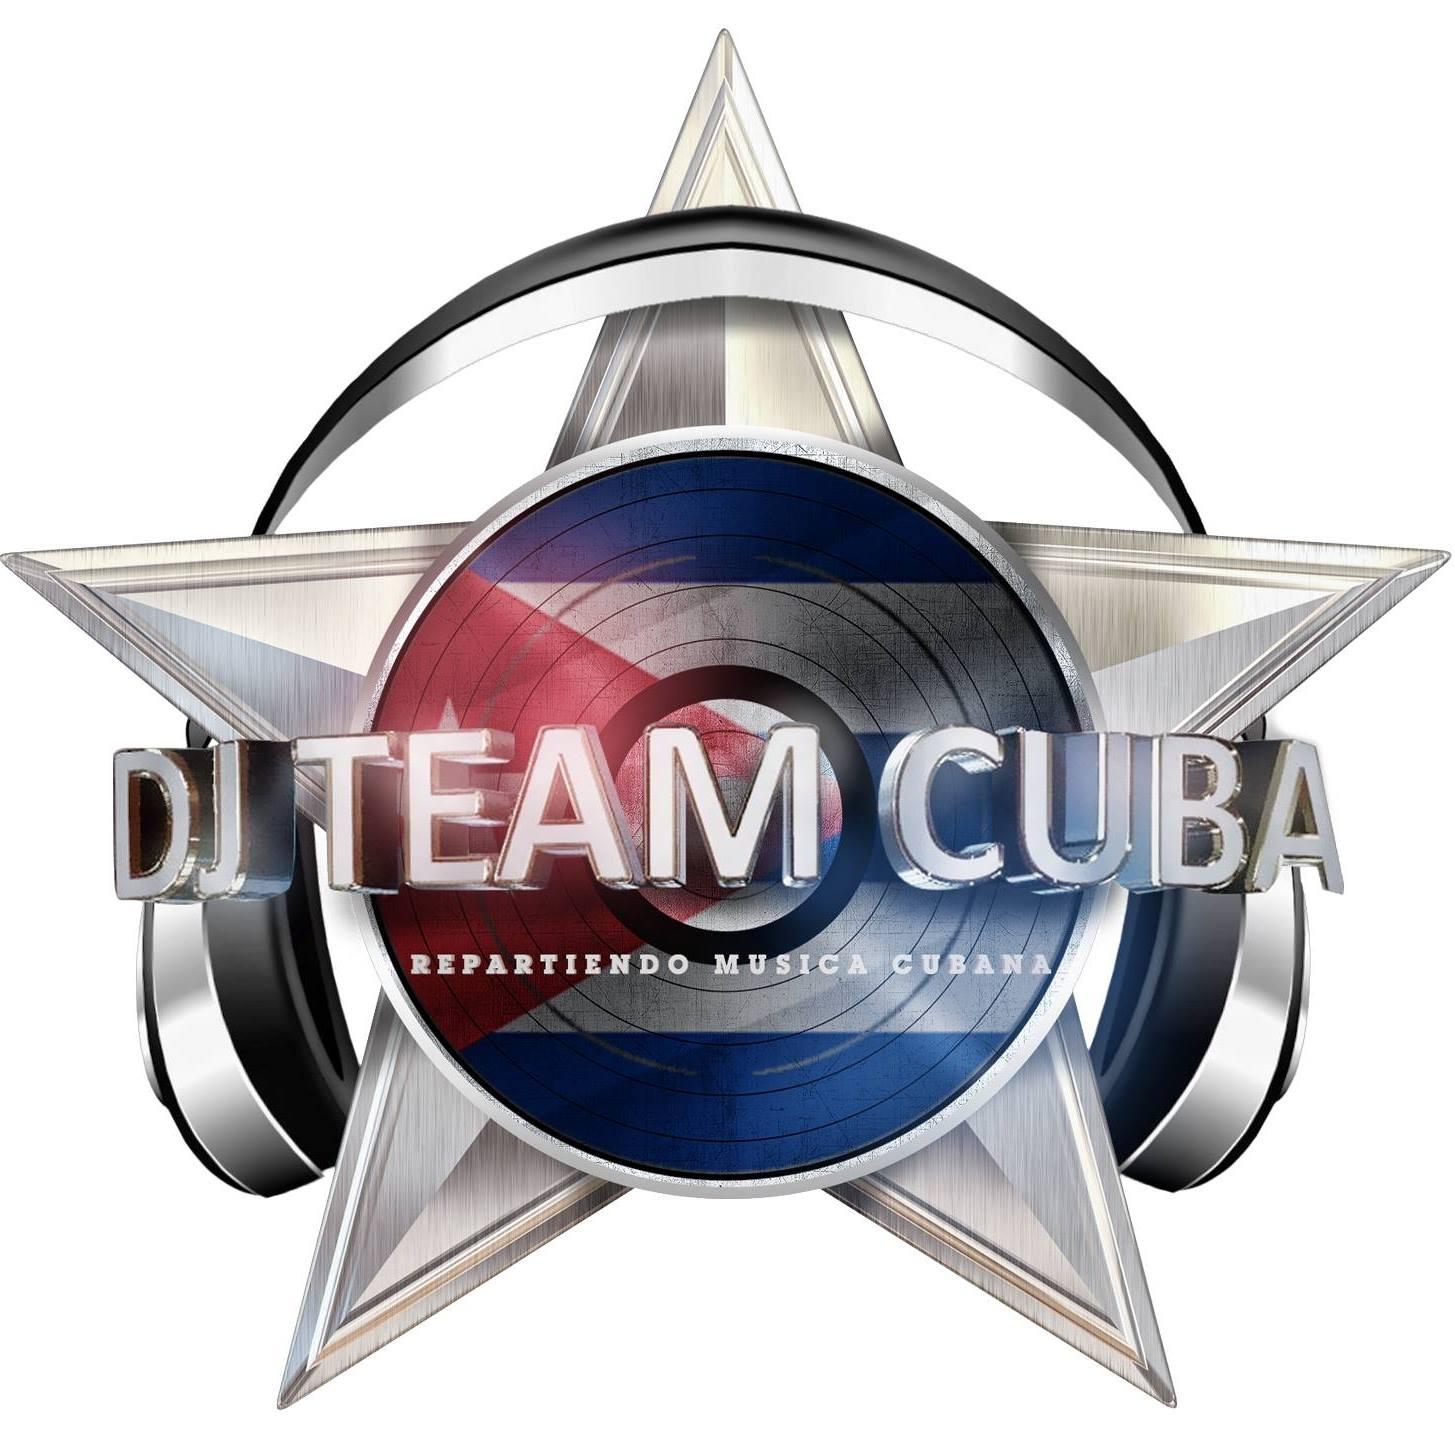 DJ Team Cuba